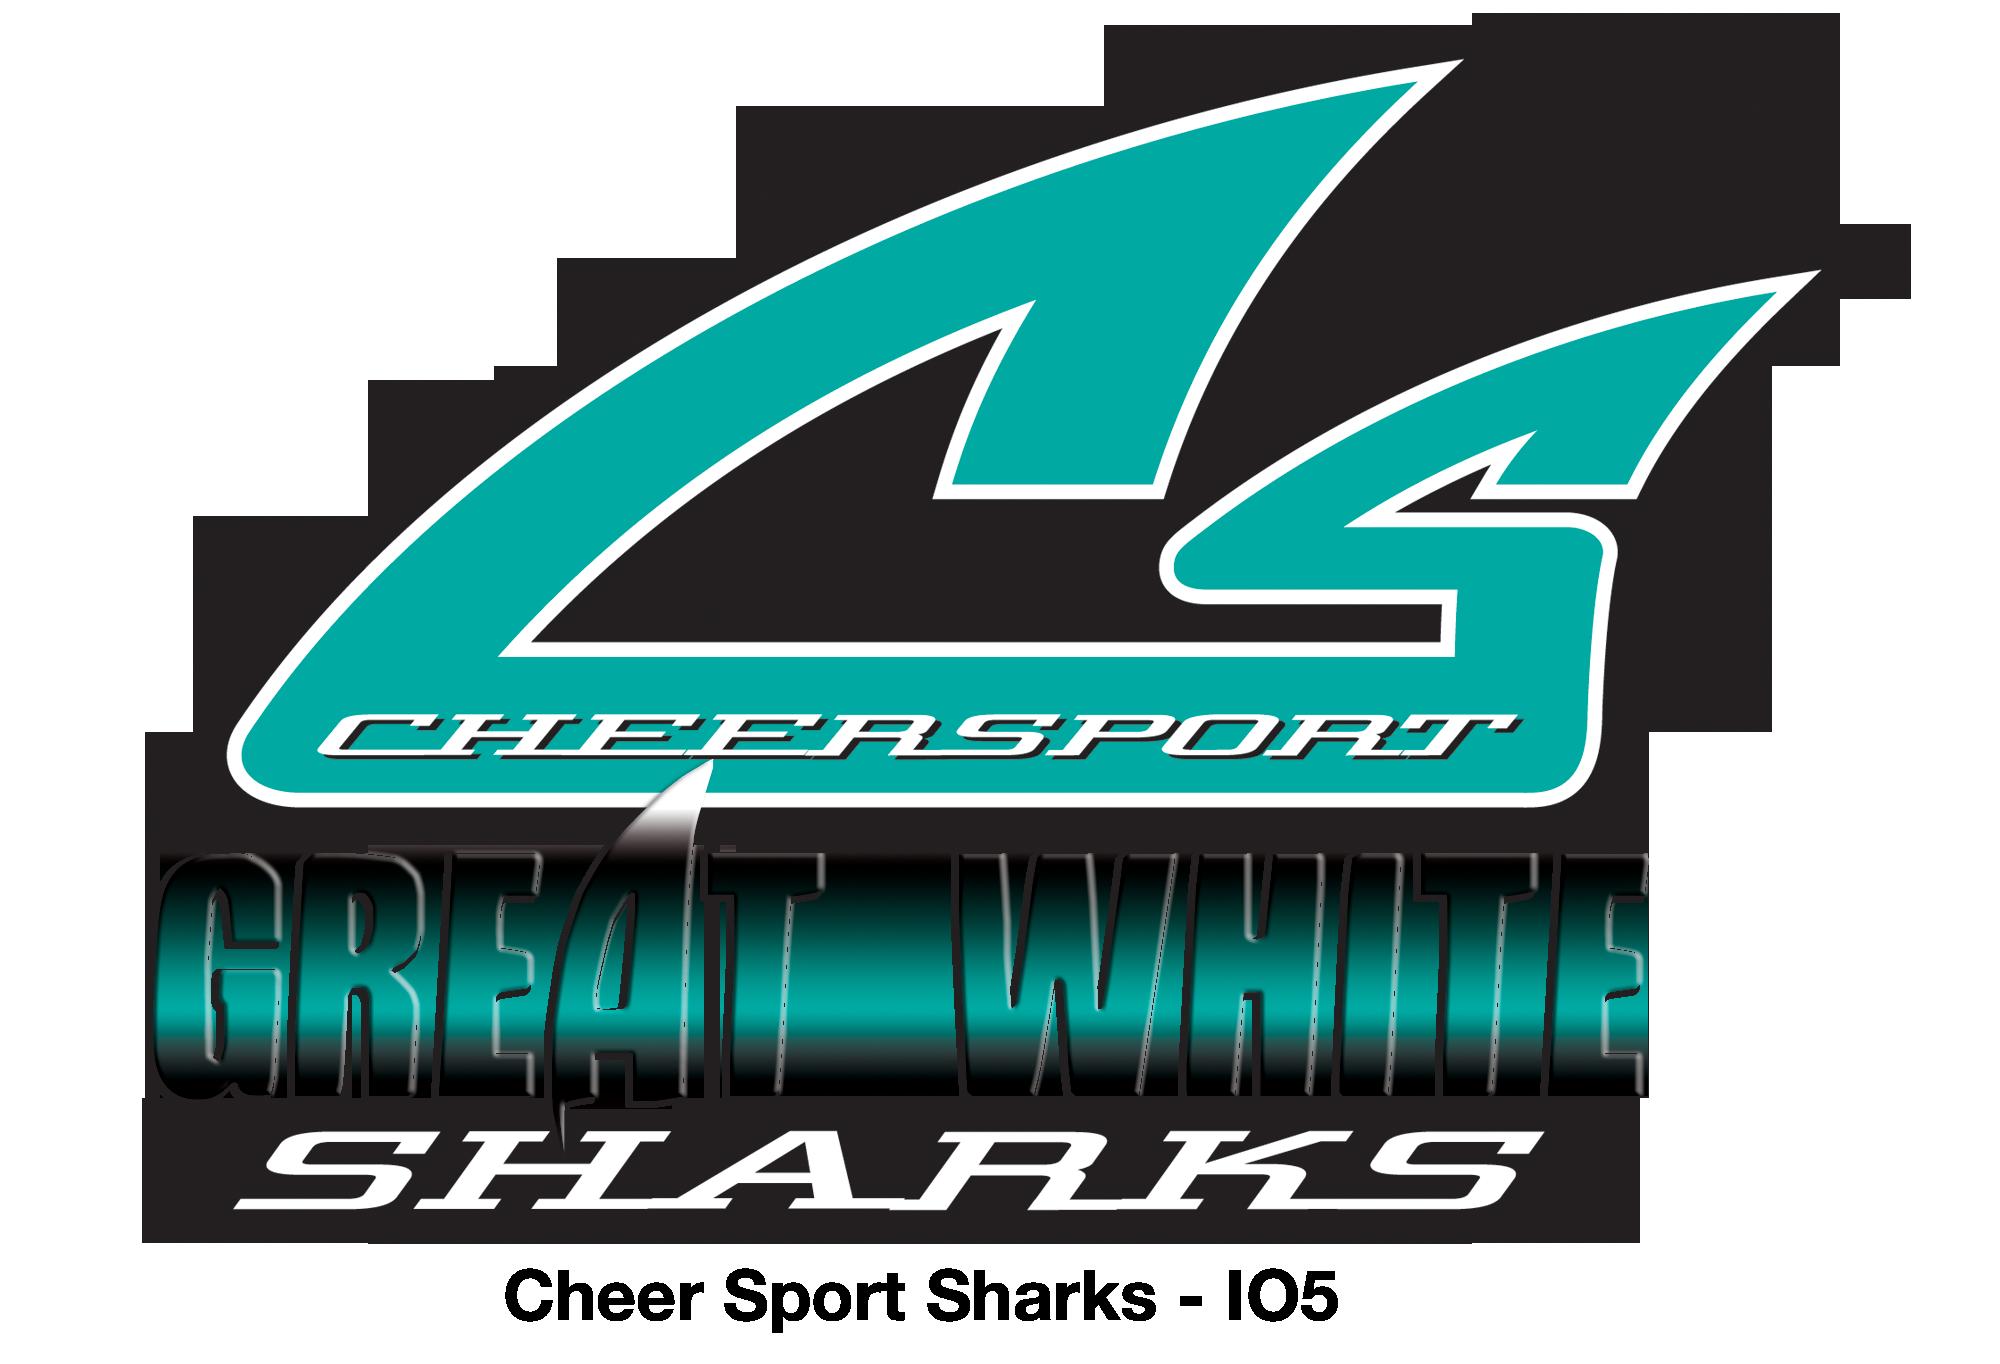 Great white sharks cheer by Cheergirl on Cheer Shark